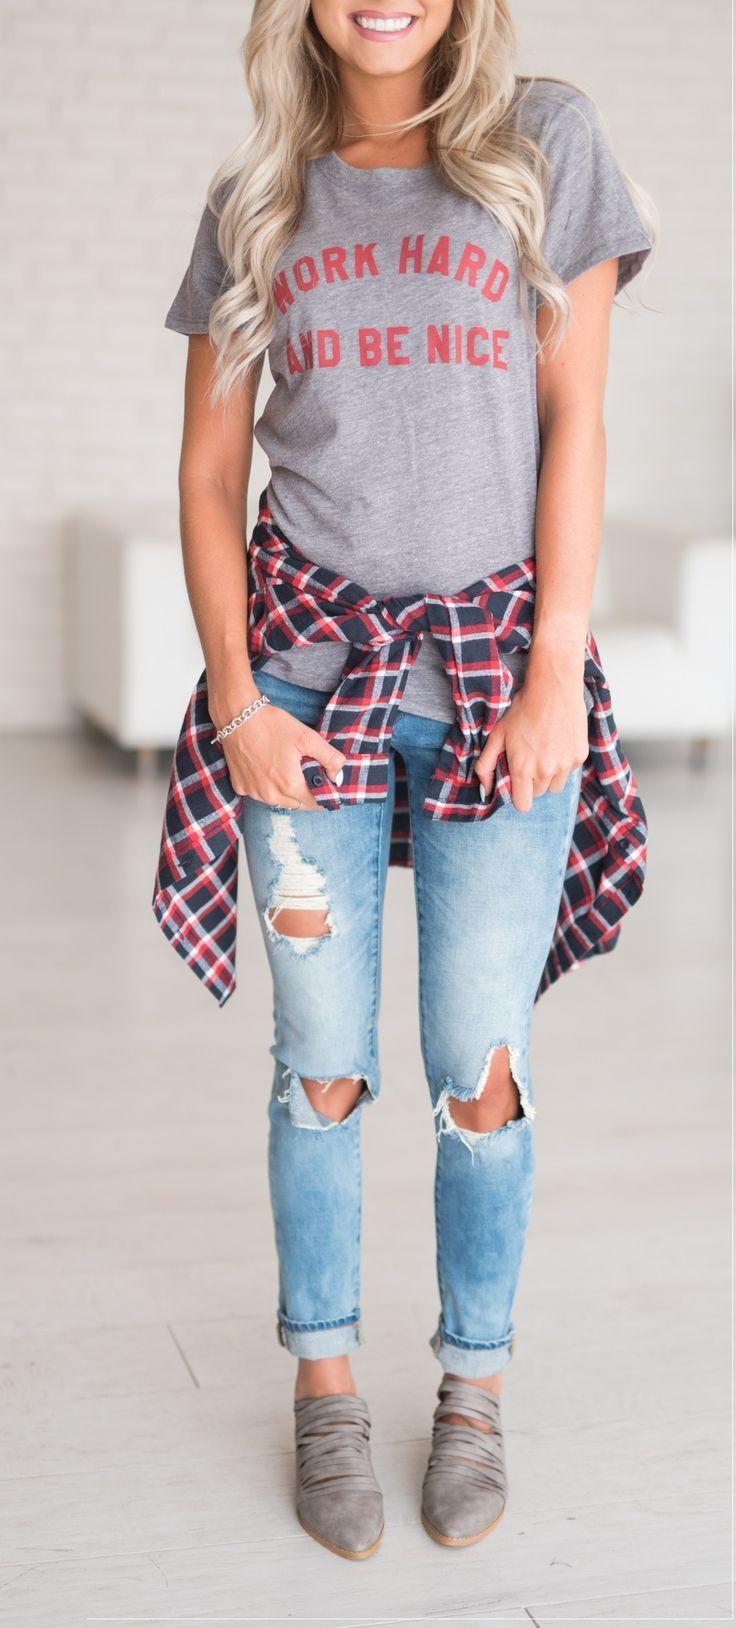 Work Hard & Be Nice, Suburban Riot Tee via Mindy Mae's Market \\  Cute Fall Outfit Ideas